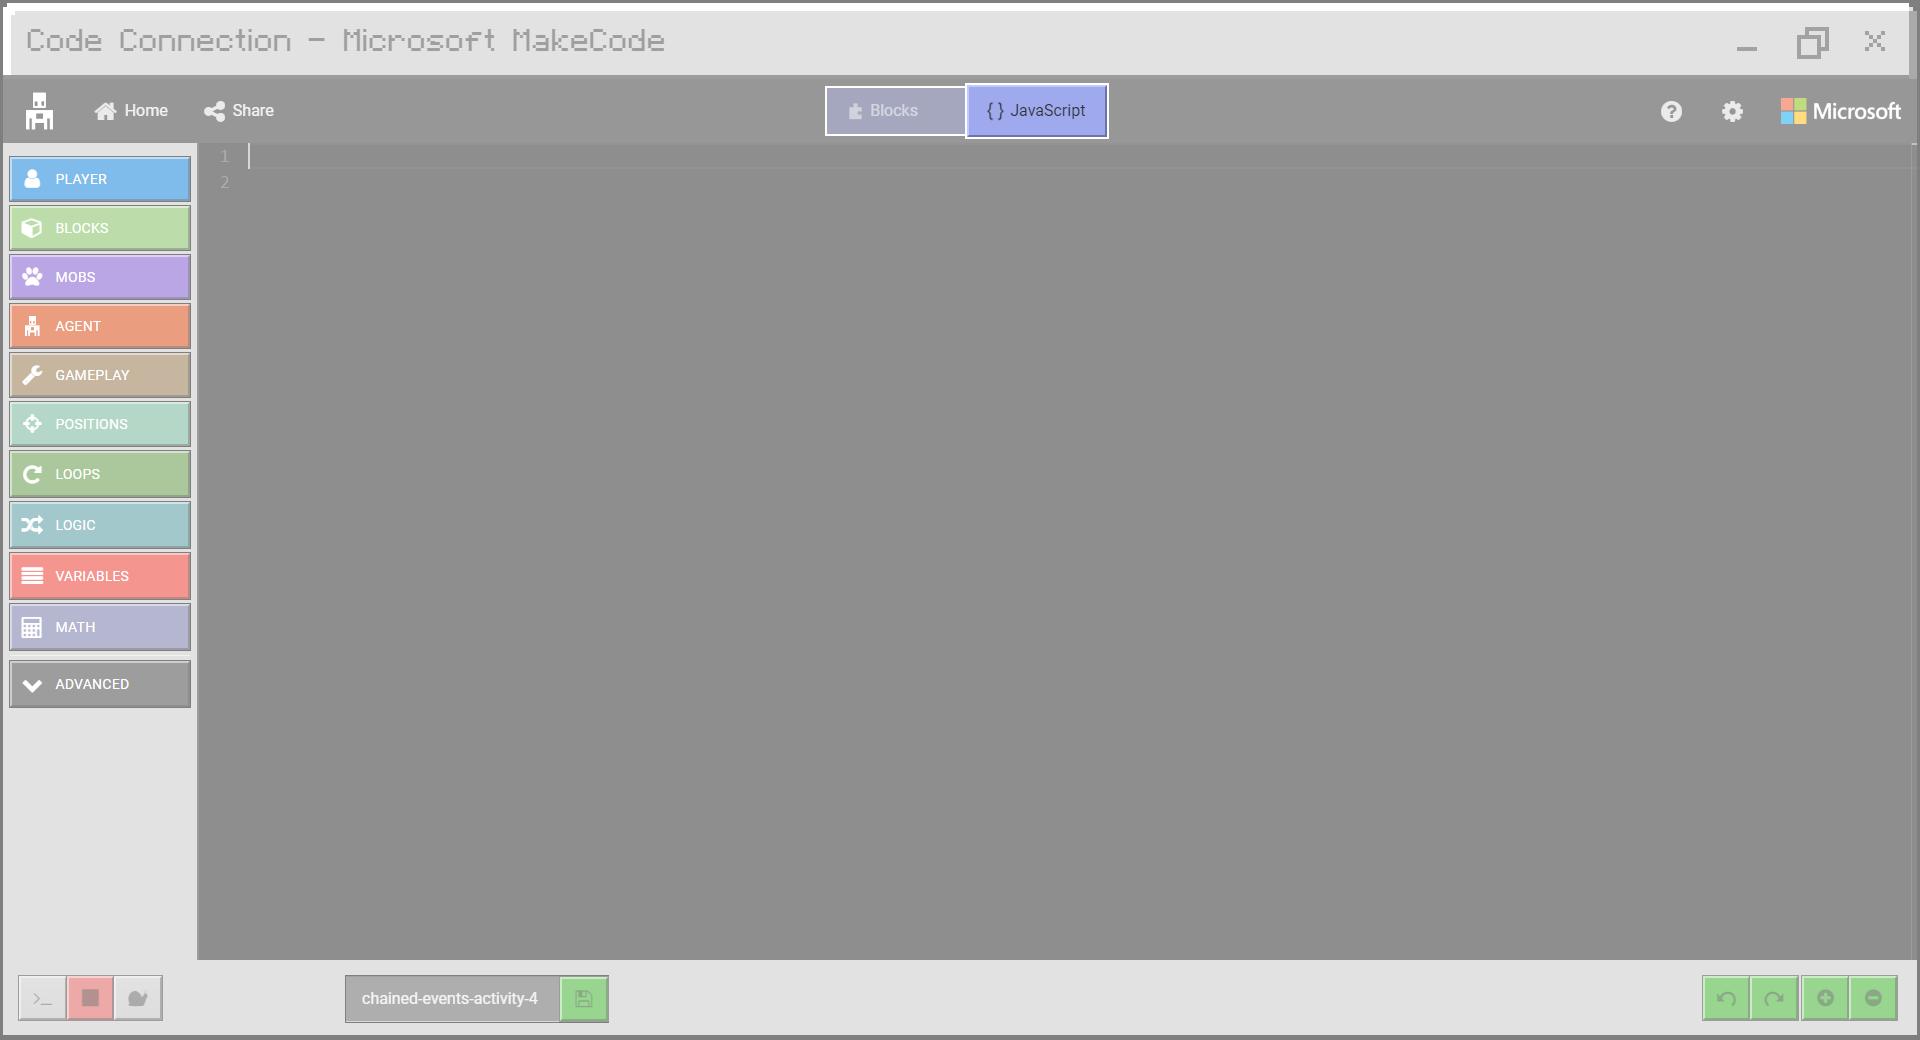 Paste Starter Code in Editor